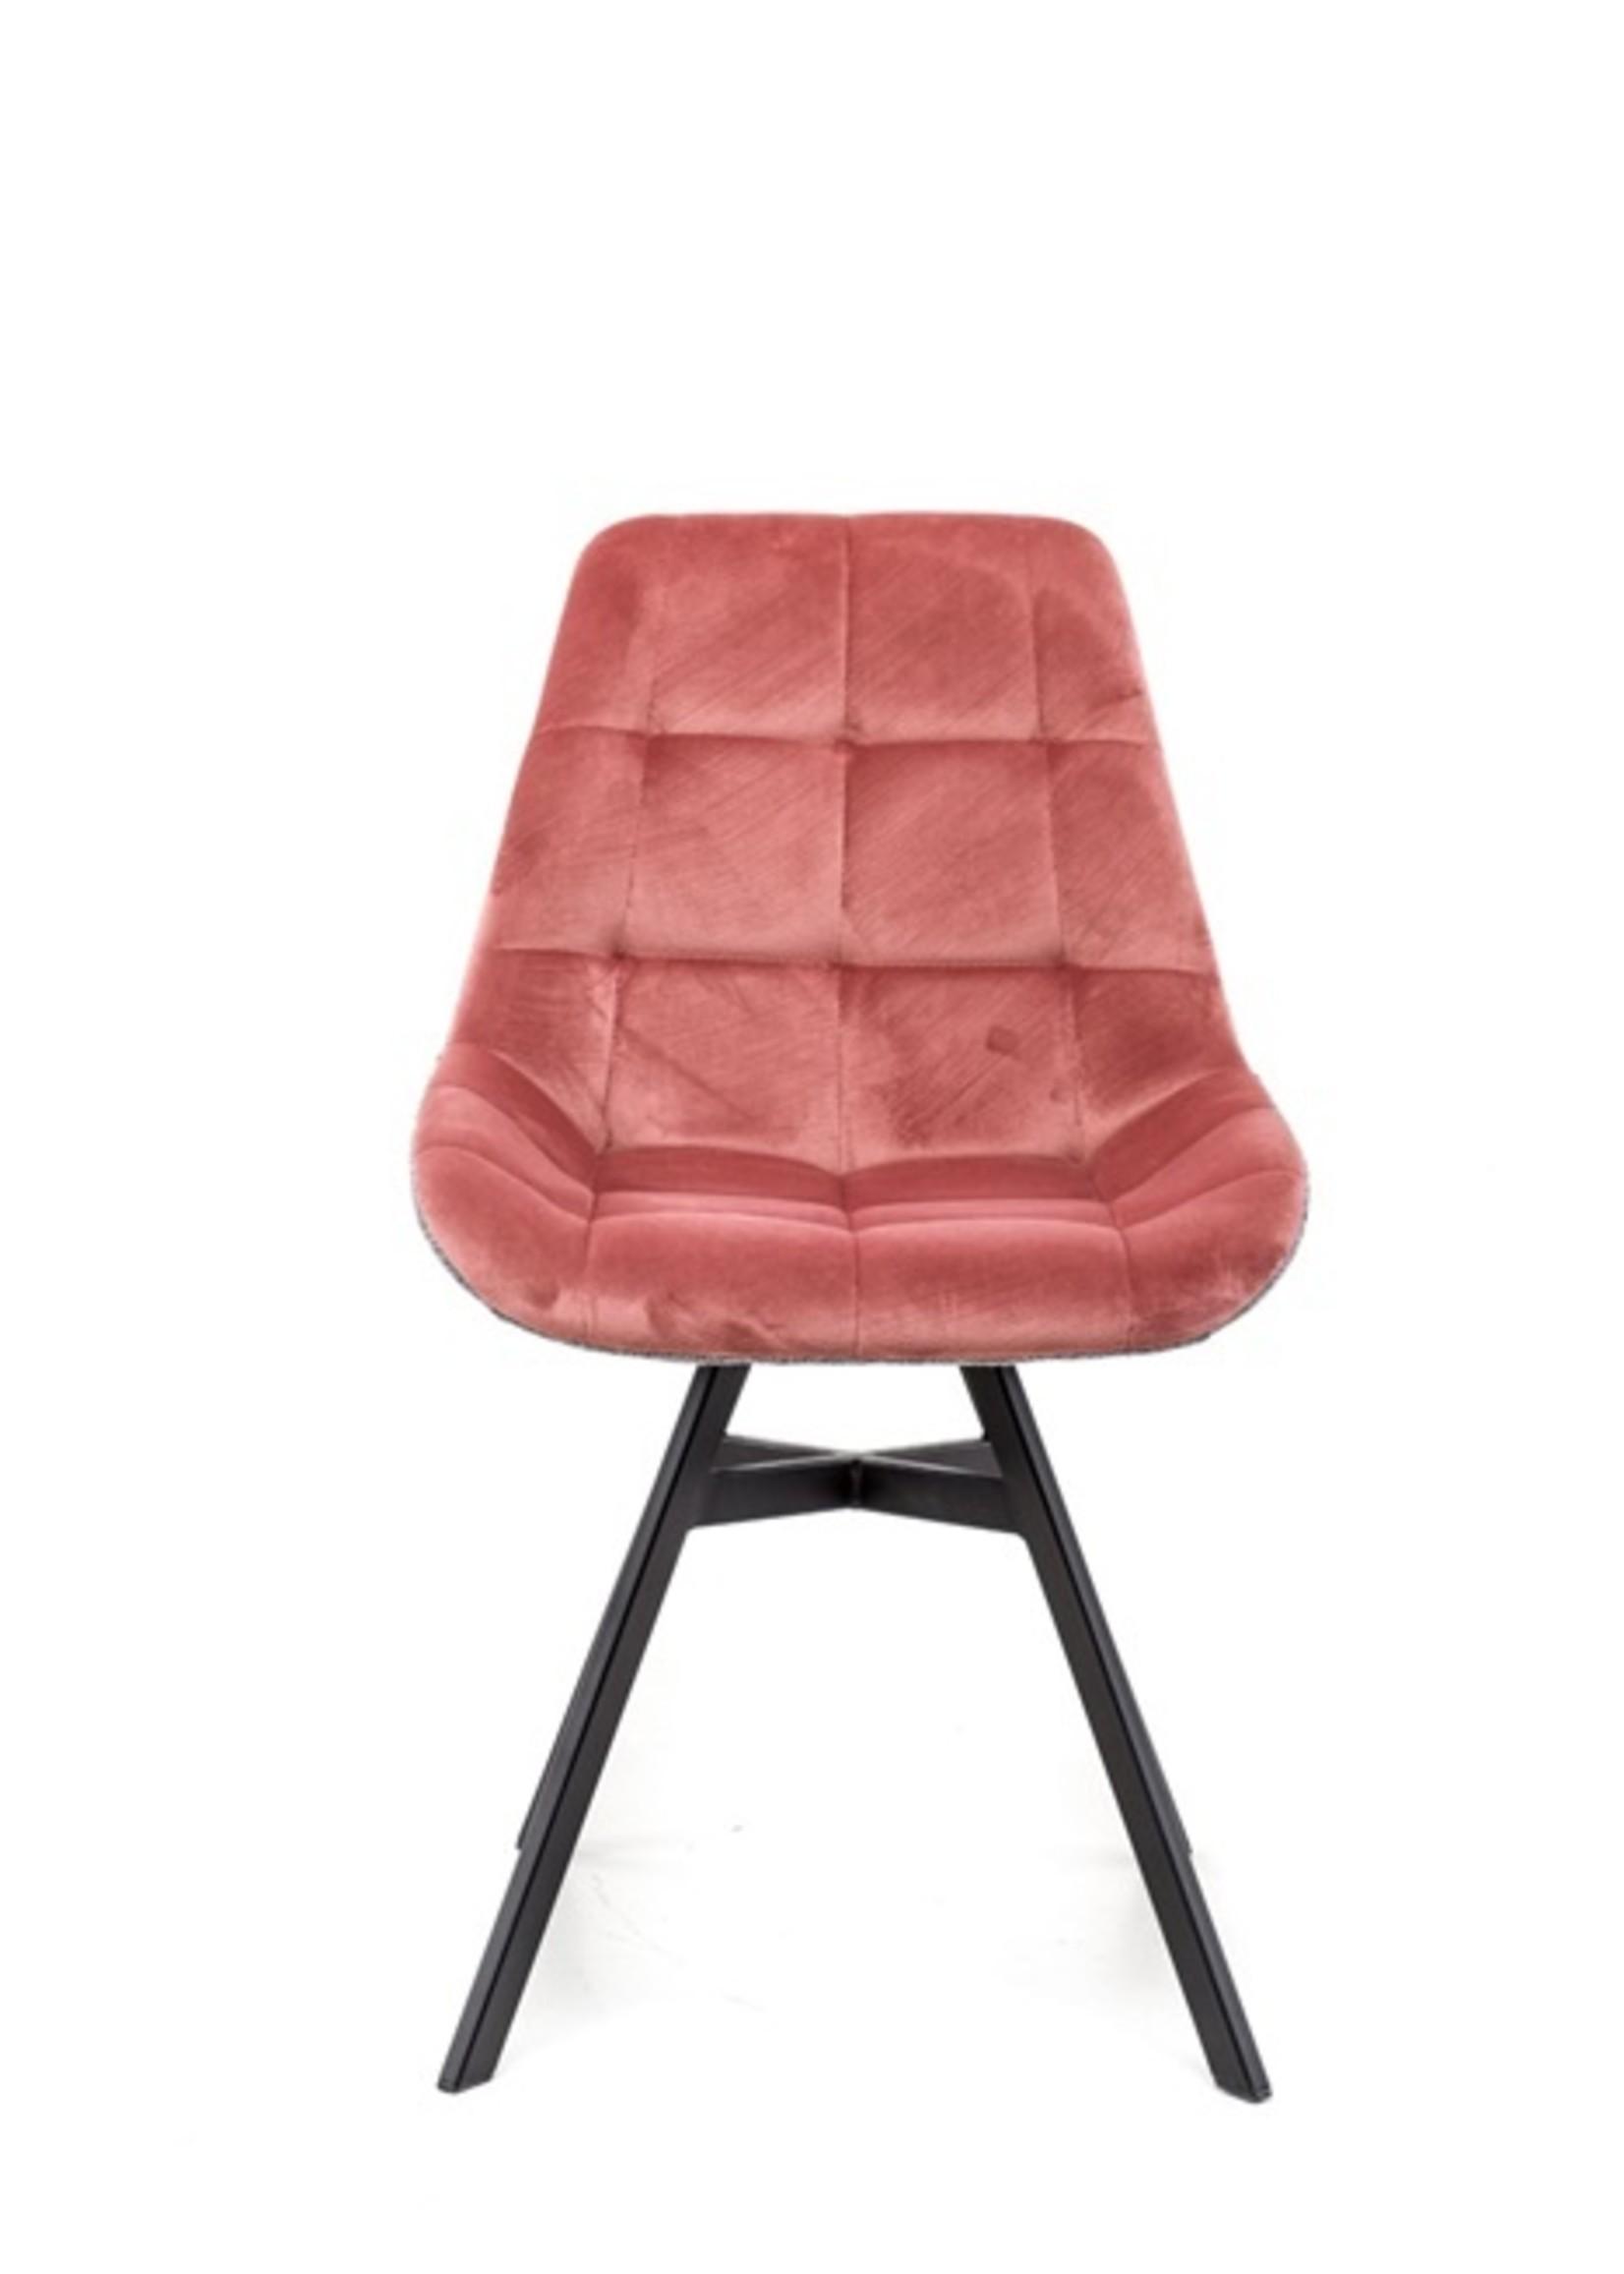 Moods Collection Eetkamerstoel Giulia Monaco pink